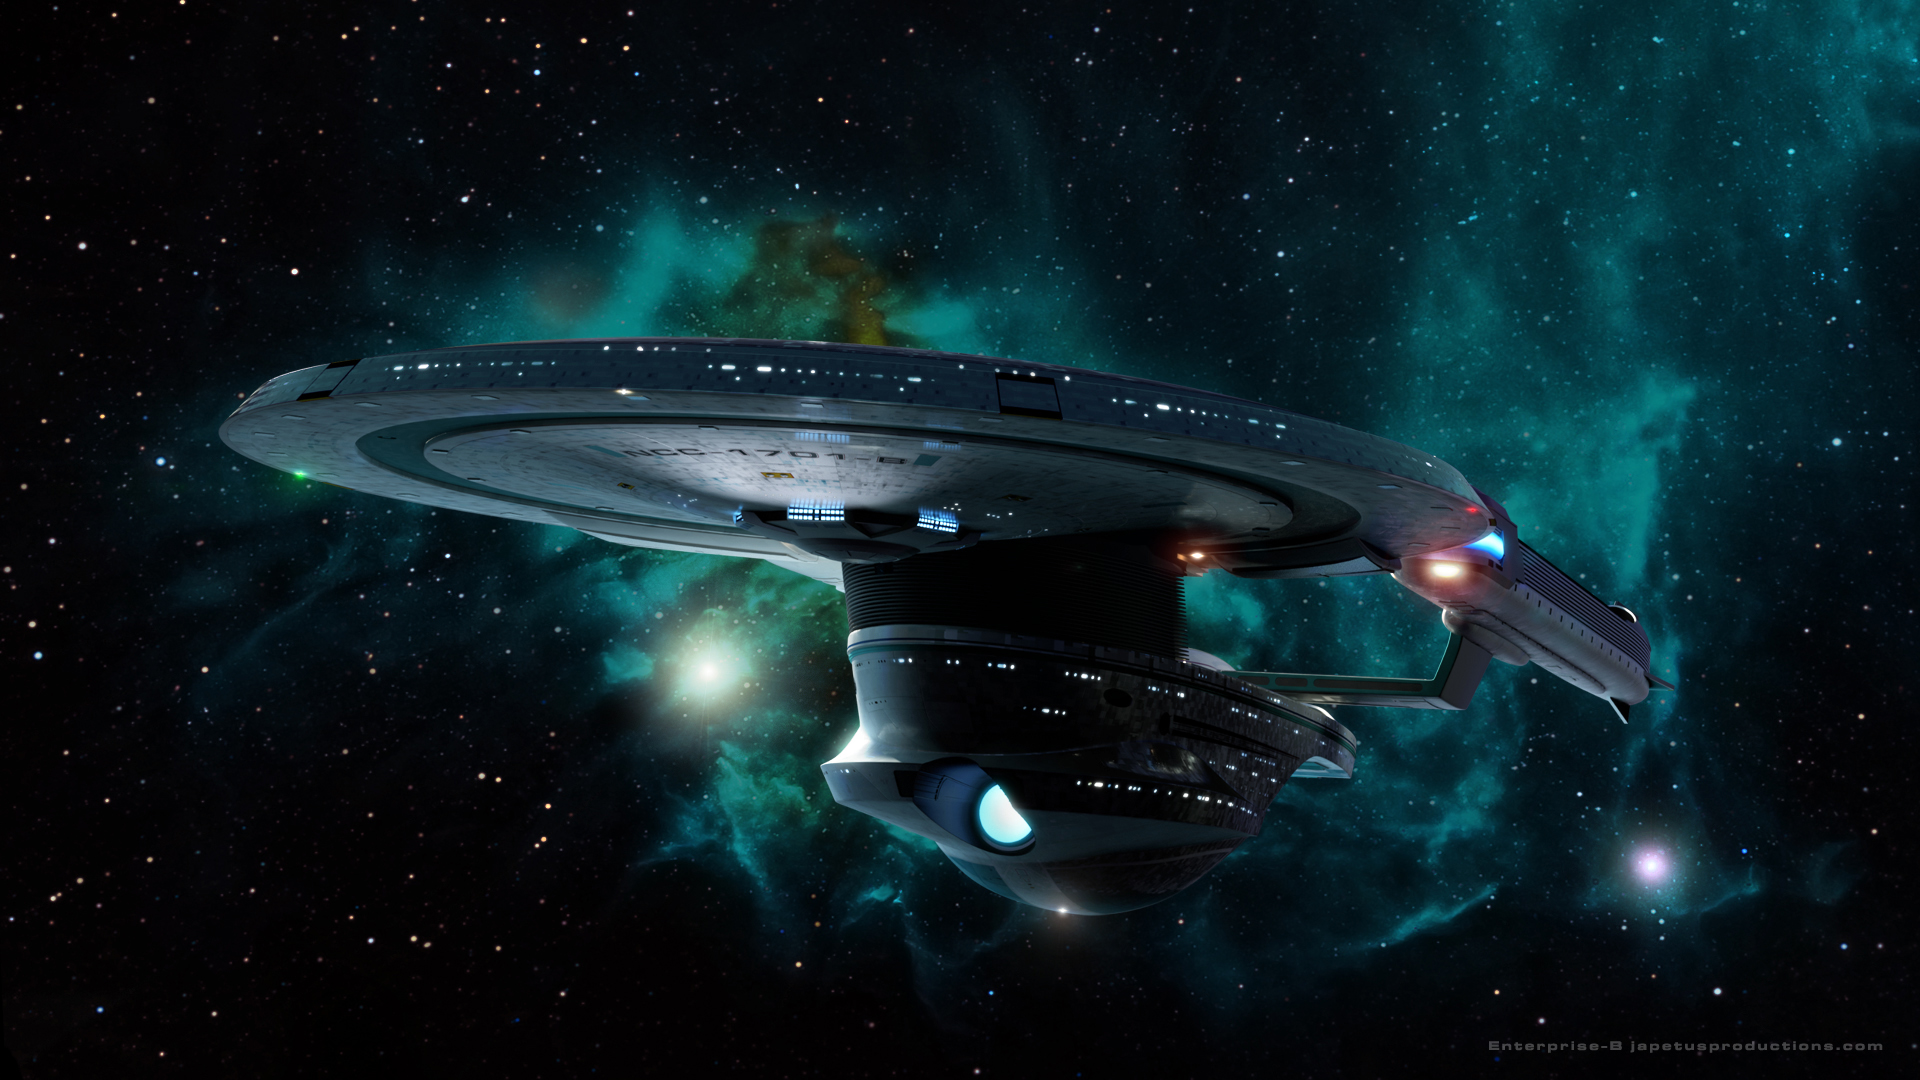 Star Trek Starship Enterprise Spaceship Stars Nebula 1920x1080